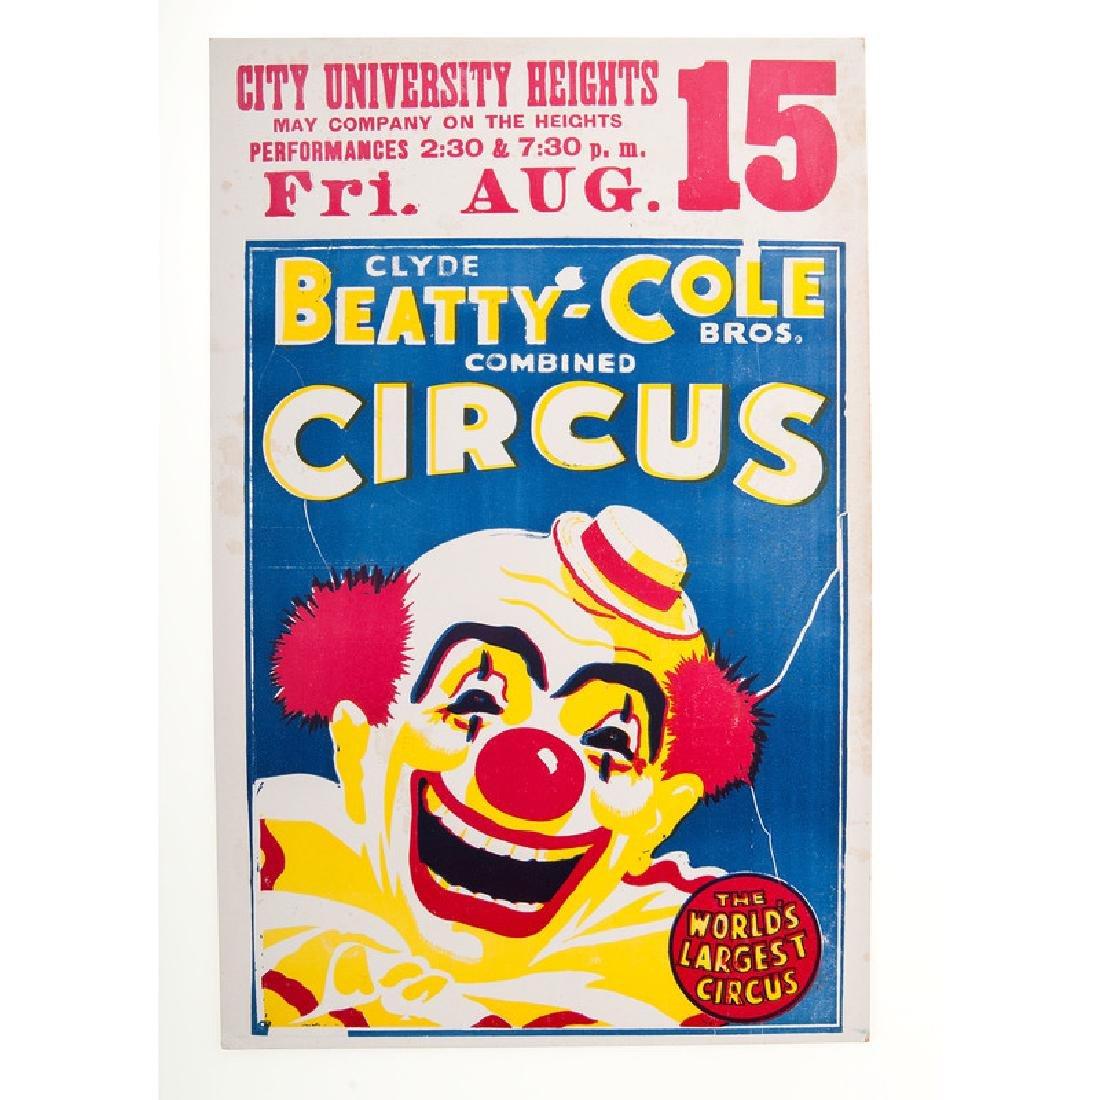 American Circus Posters - 4